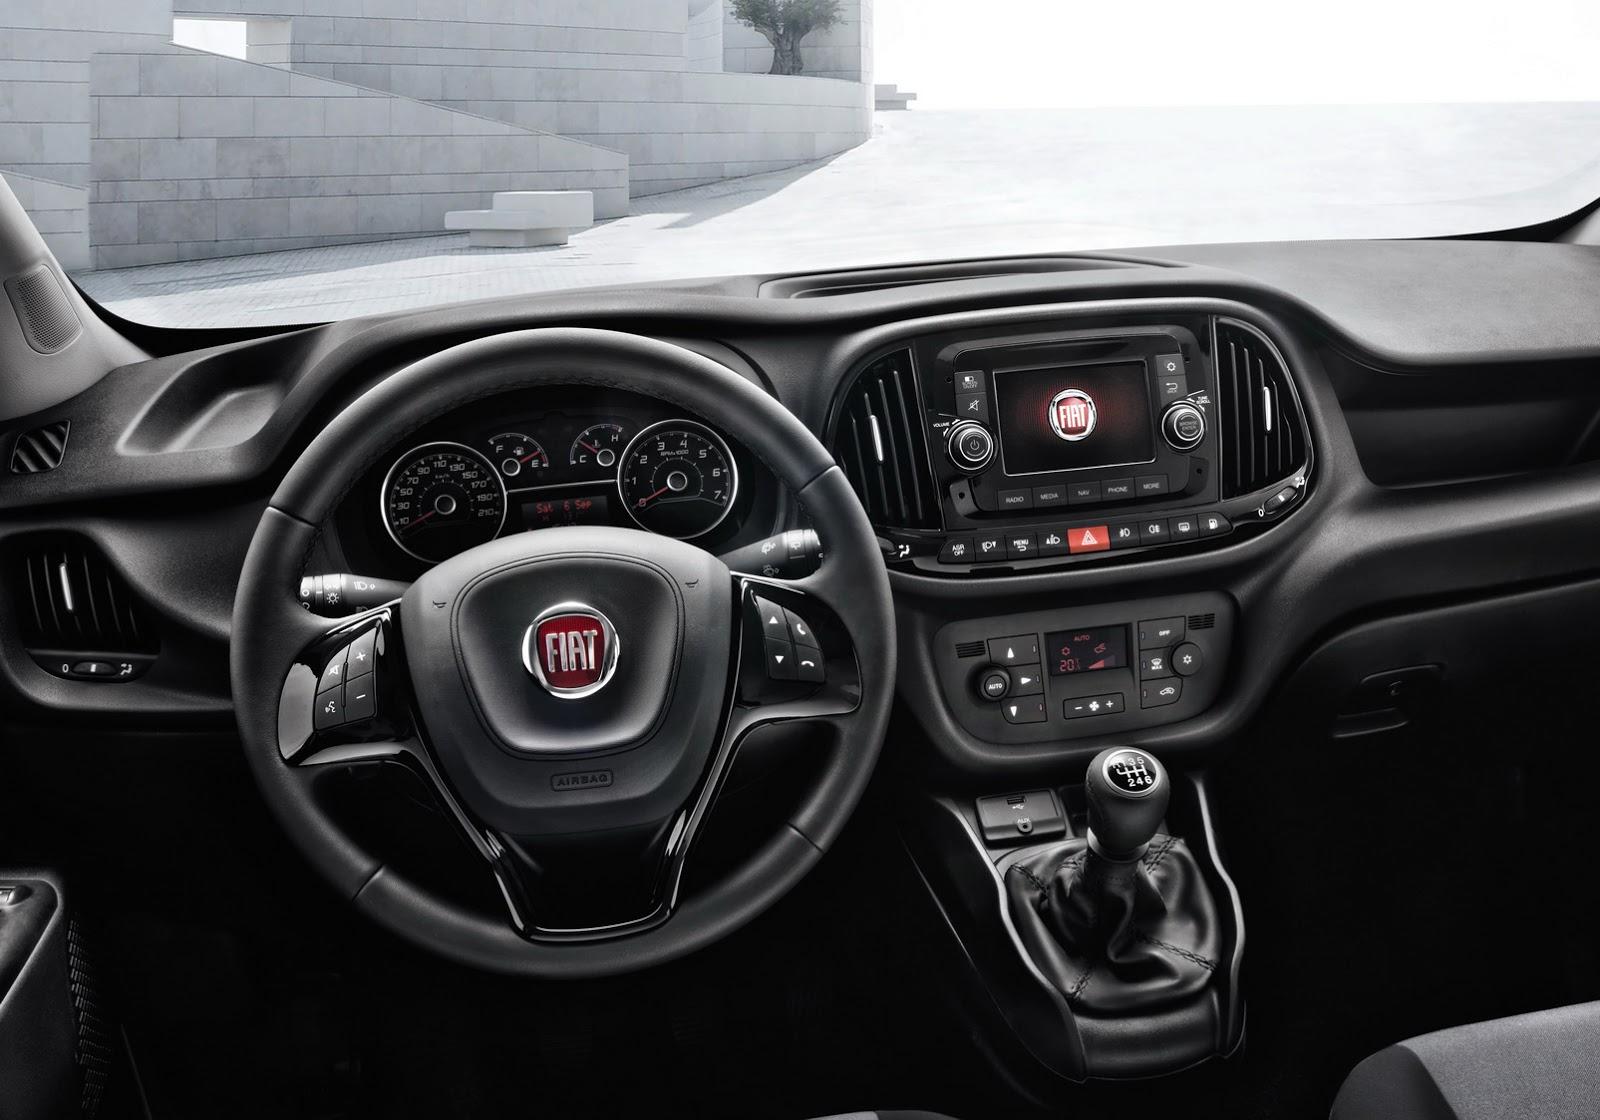 Click image for larger version  Name:2015-Fiat-Doblo-FL-4.jpg Views:59 Size:221.6 KB ID:144458